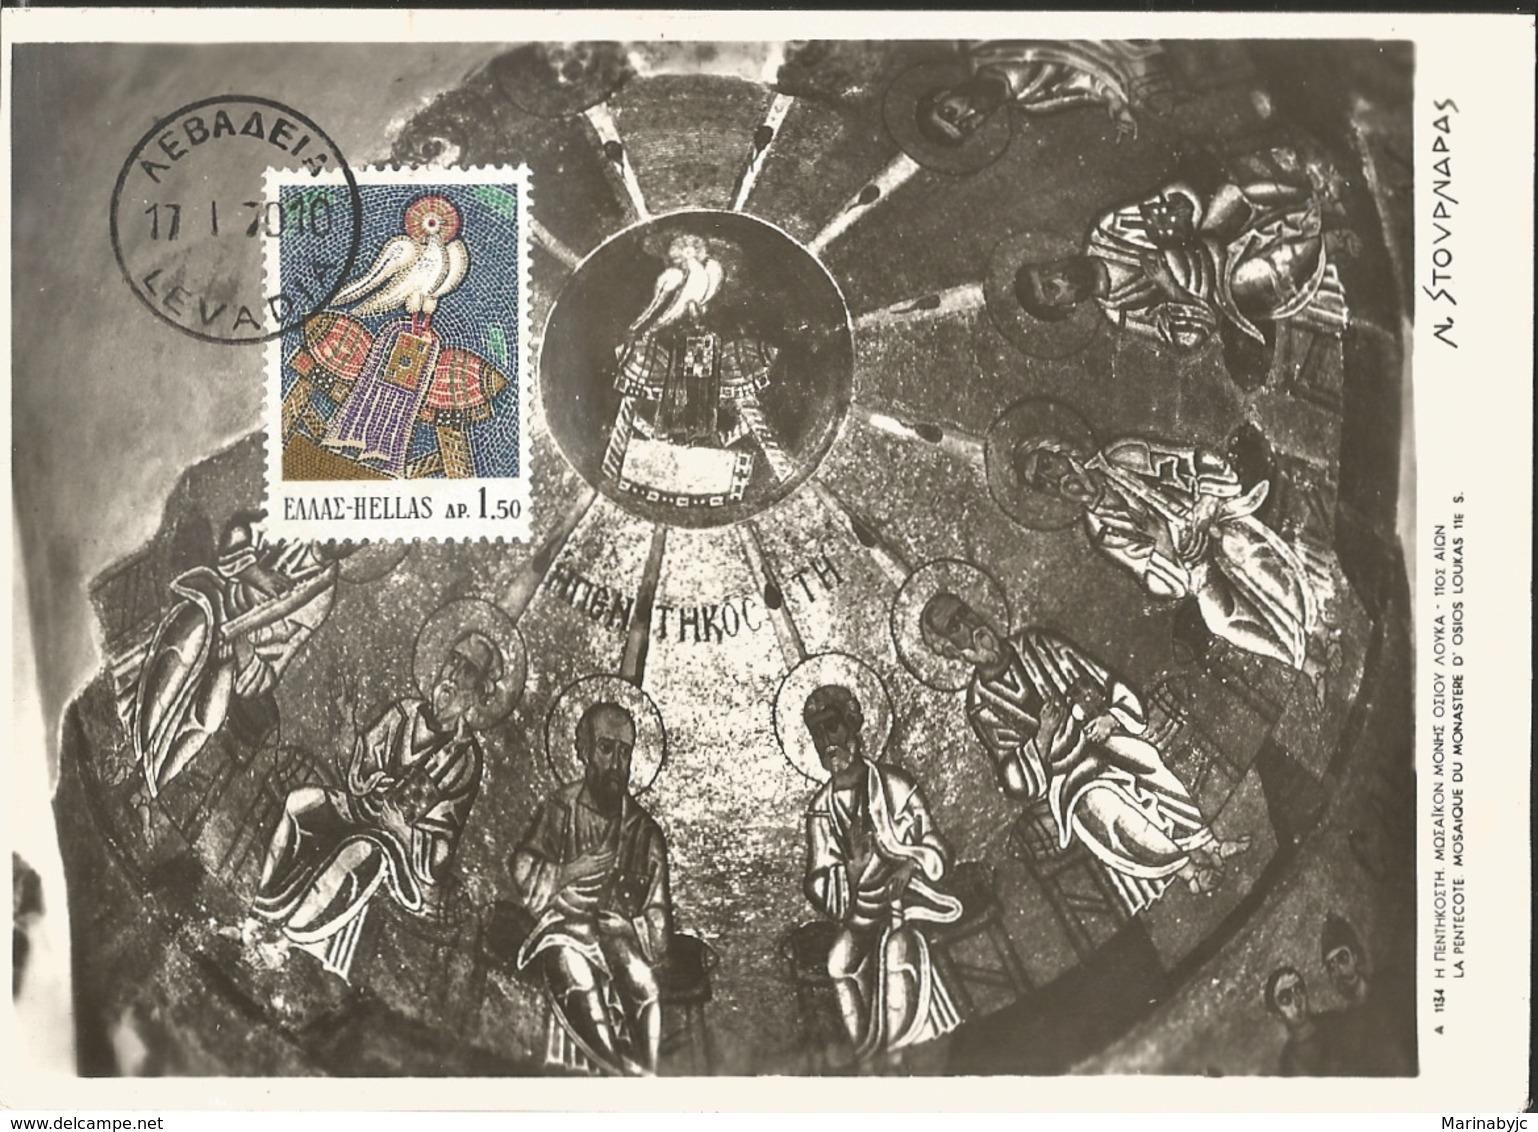 J) 1970 GREECE, THE MOSAIC PENTECOT OF THE LOUKAS OSAS MONASTERY, PAINTING, POSTCARD - Greece